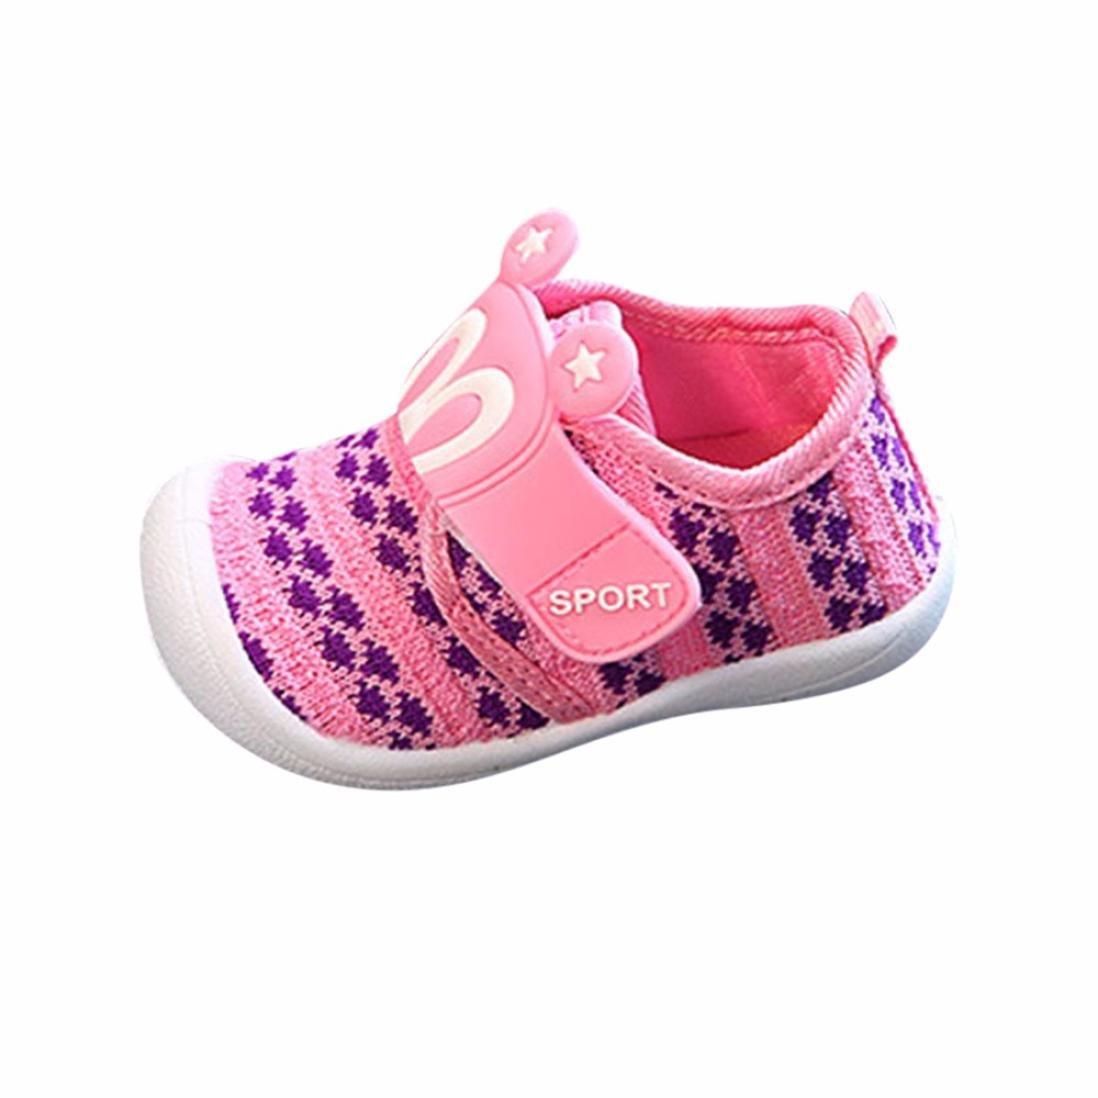 Bang Toddler children Kids Baby Cartoon Rabbit Ears Squeaky Sneaker Shoes